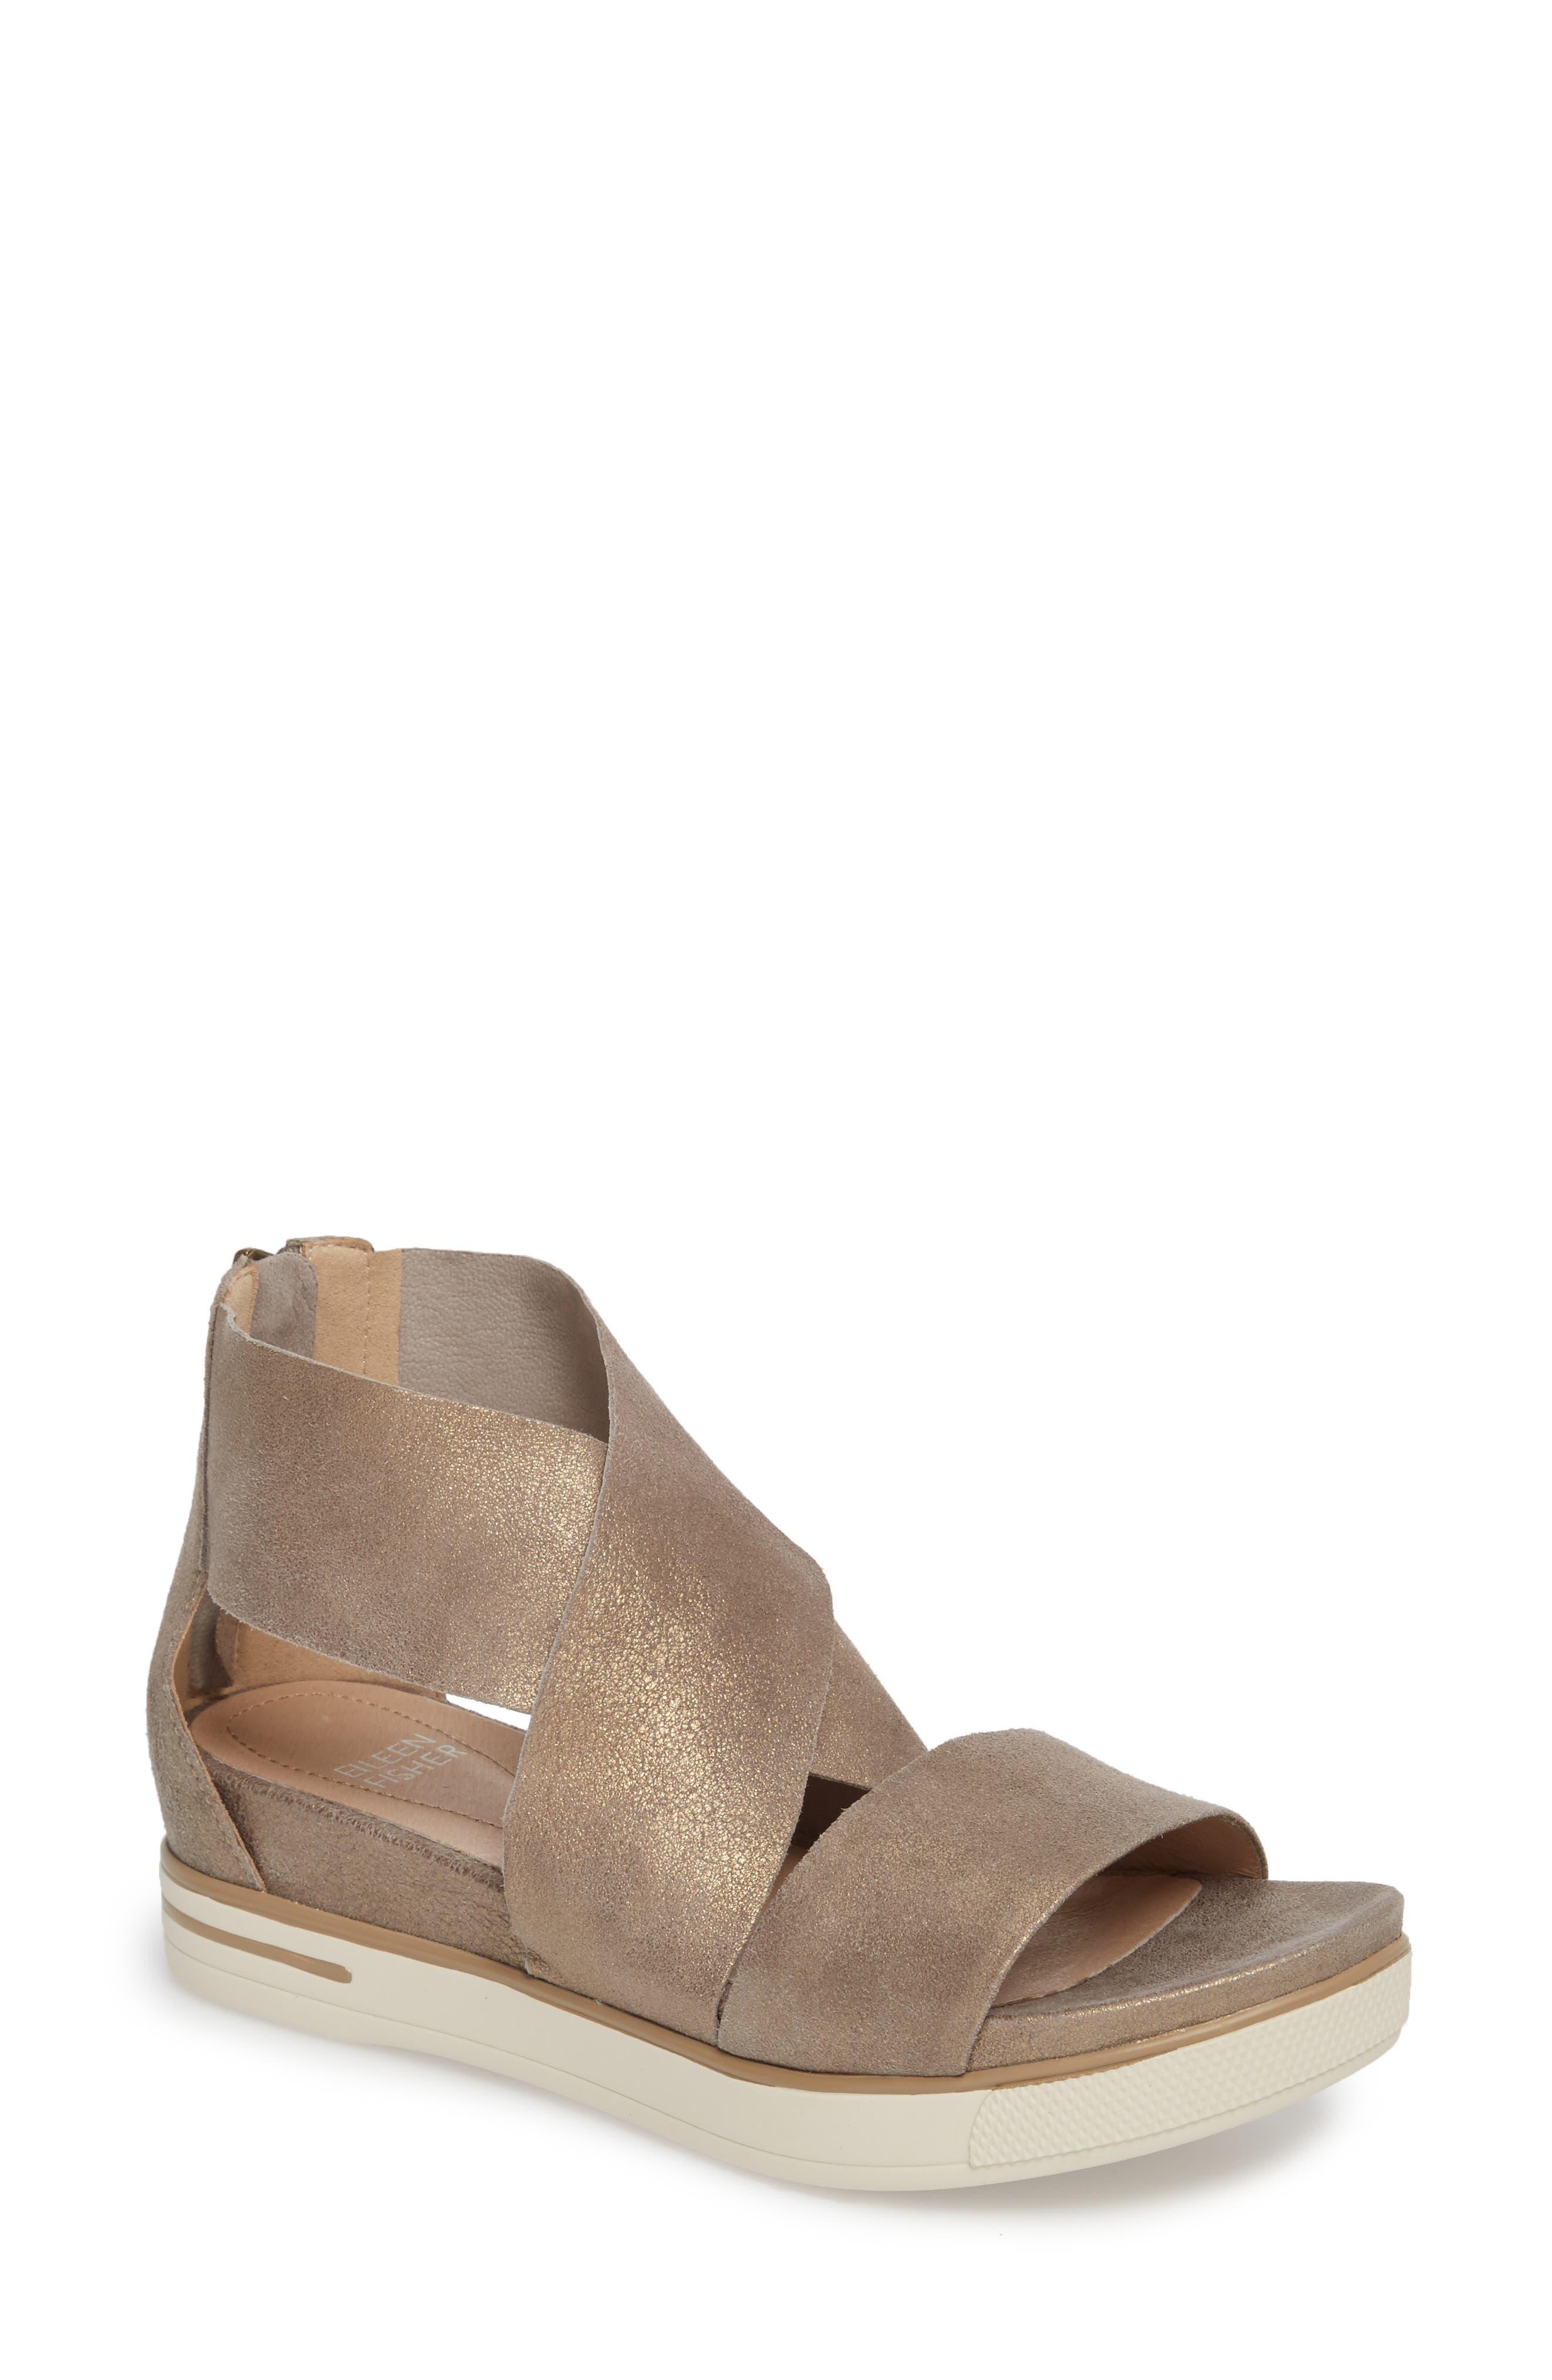 Sport Platform Sandal,                         Main,                         color, Platinum Leather